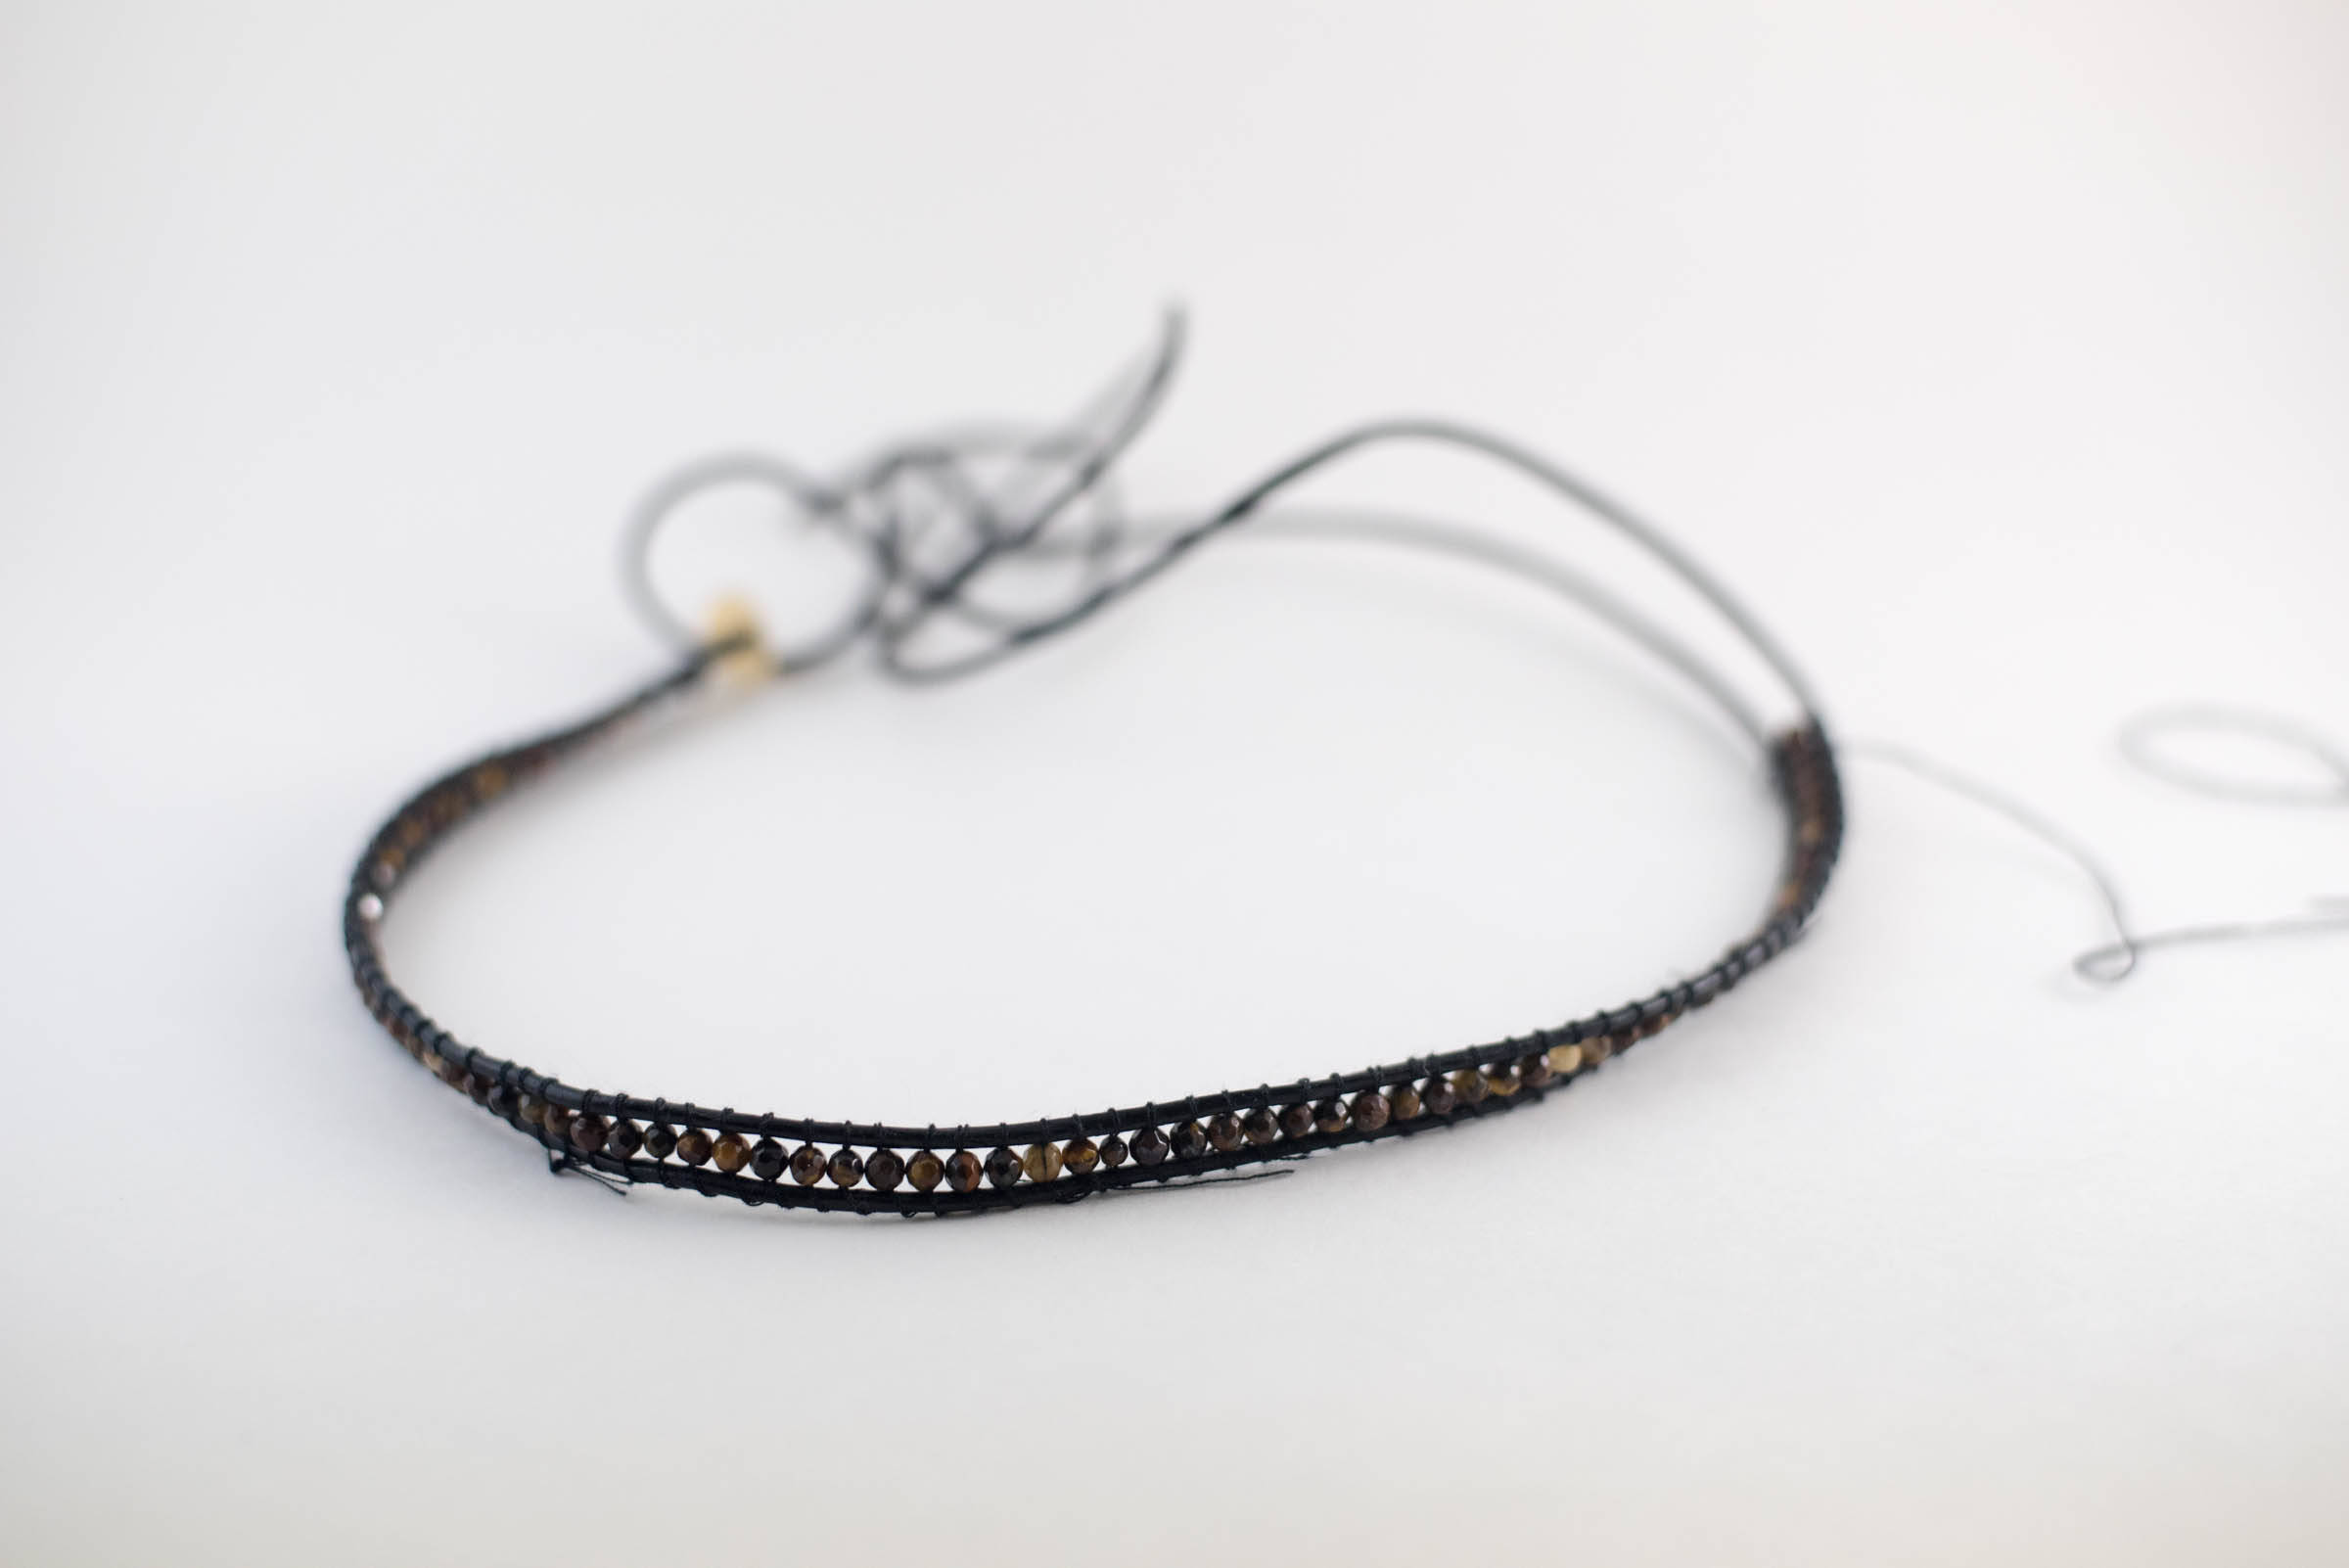 diy-double-wrap-leather-bracelet-2